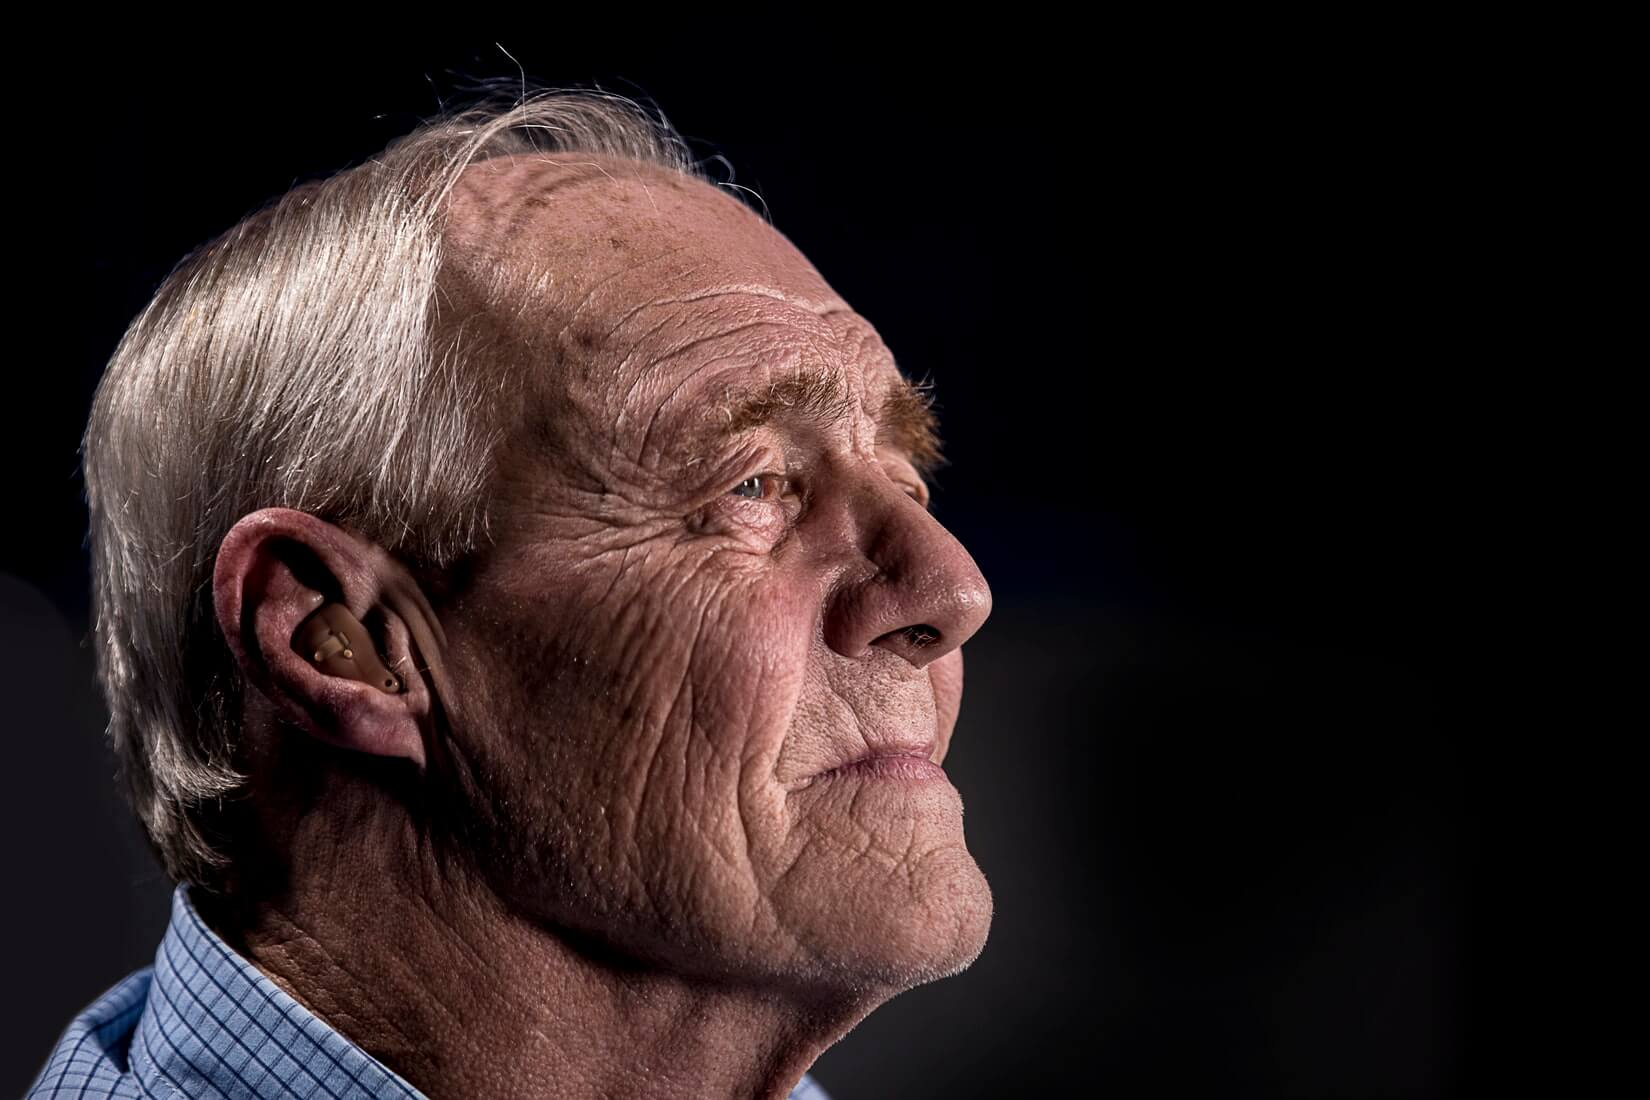 Medicina Tradicional Chinesa na luta contra o Parkinson